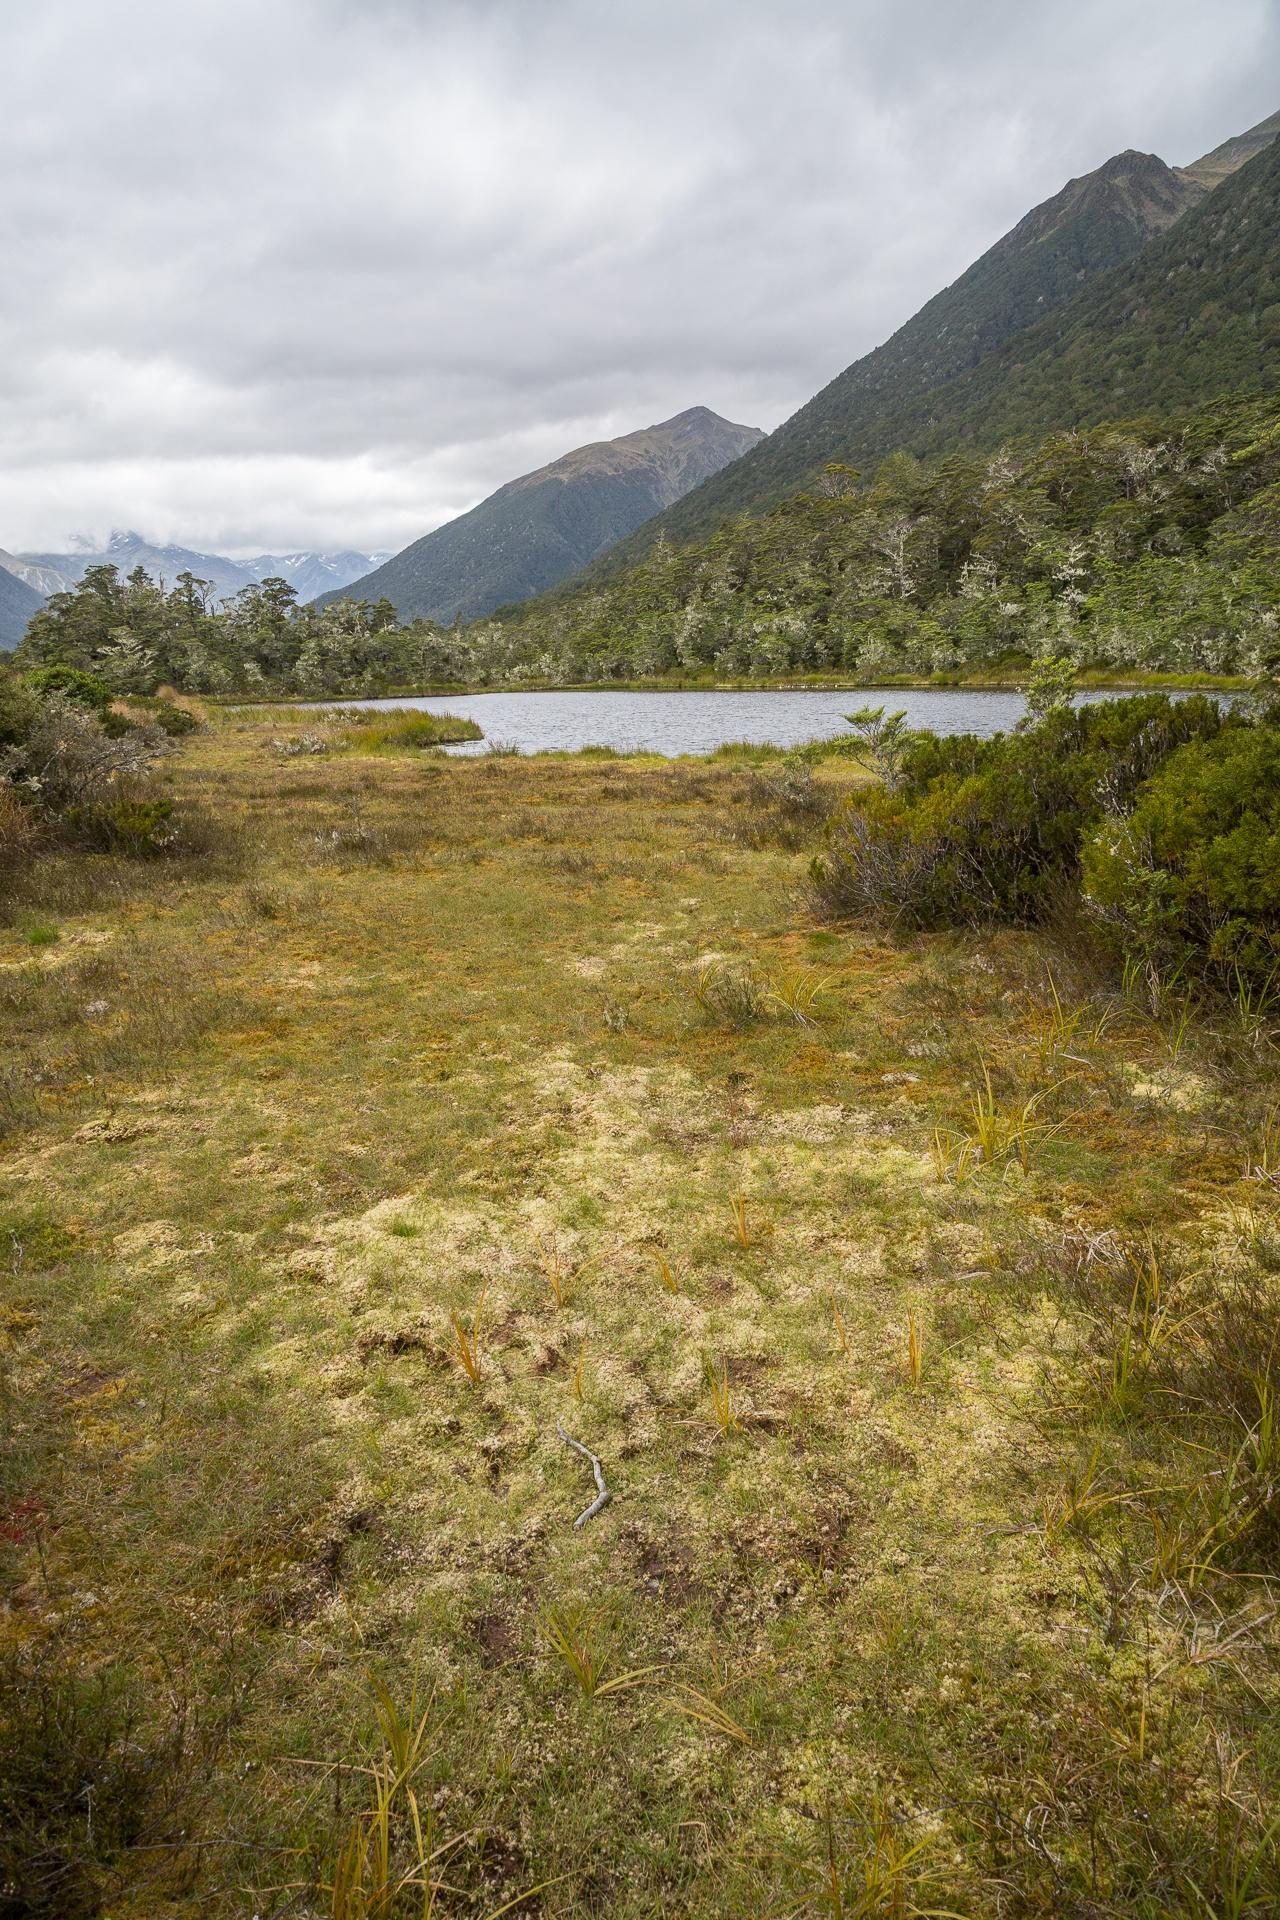 Marshes at shore of mountain lake